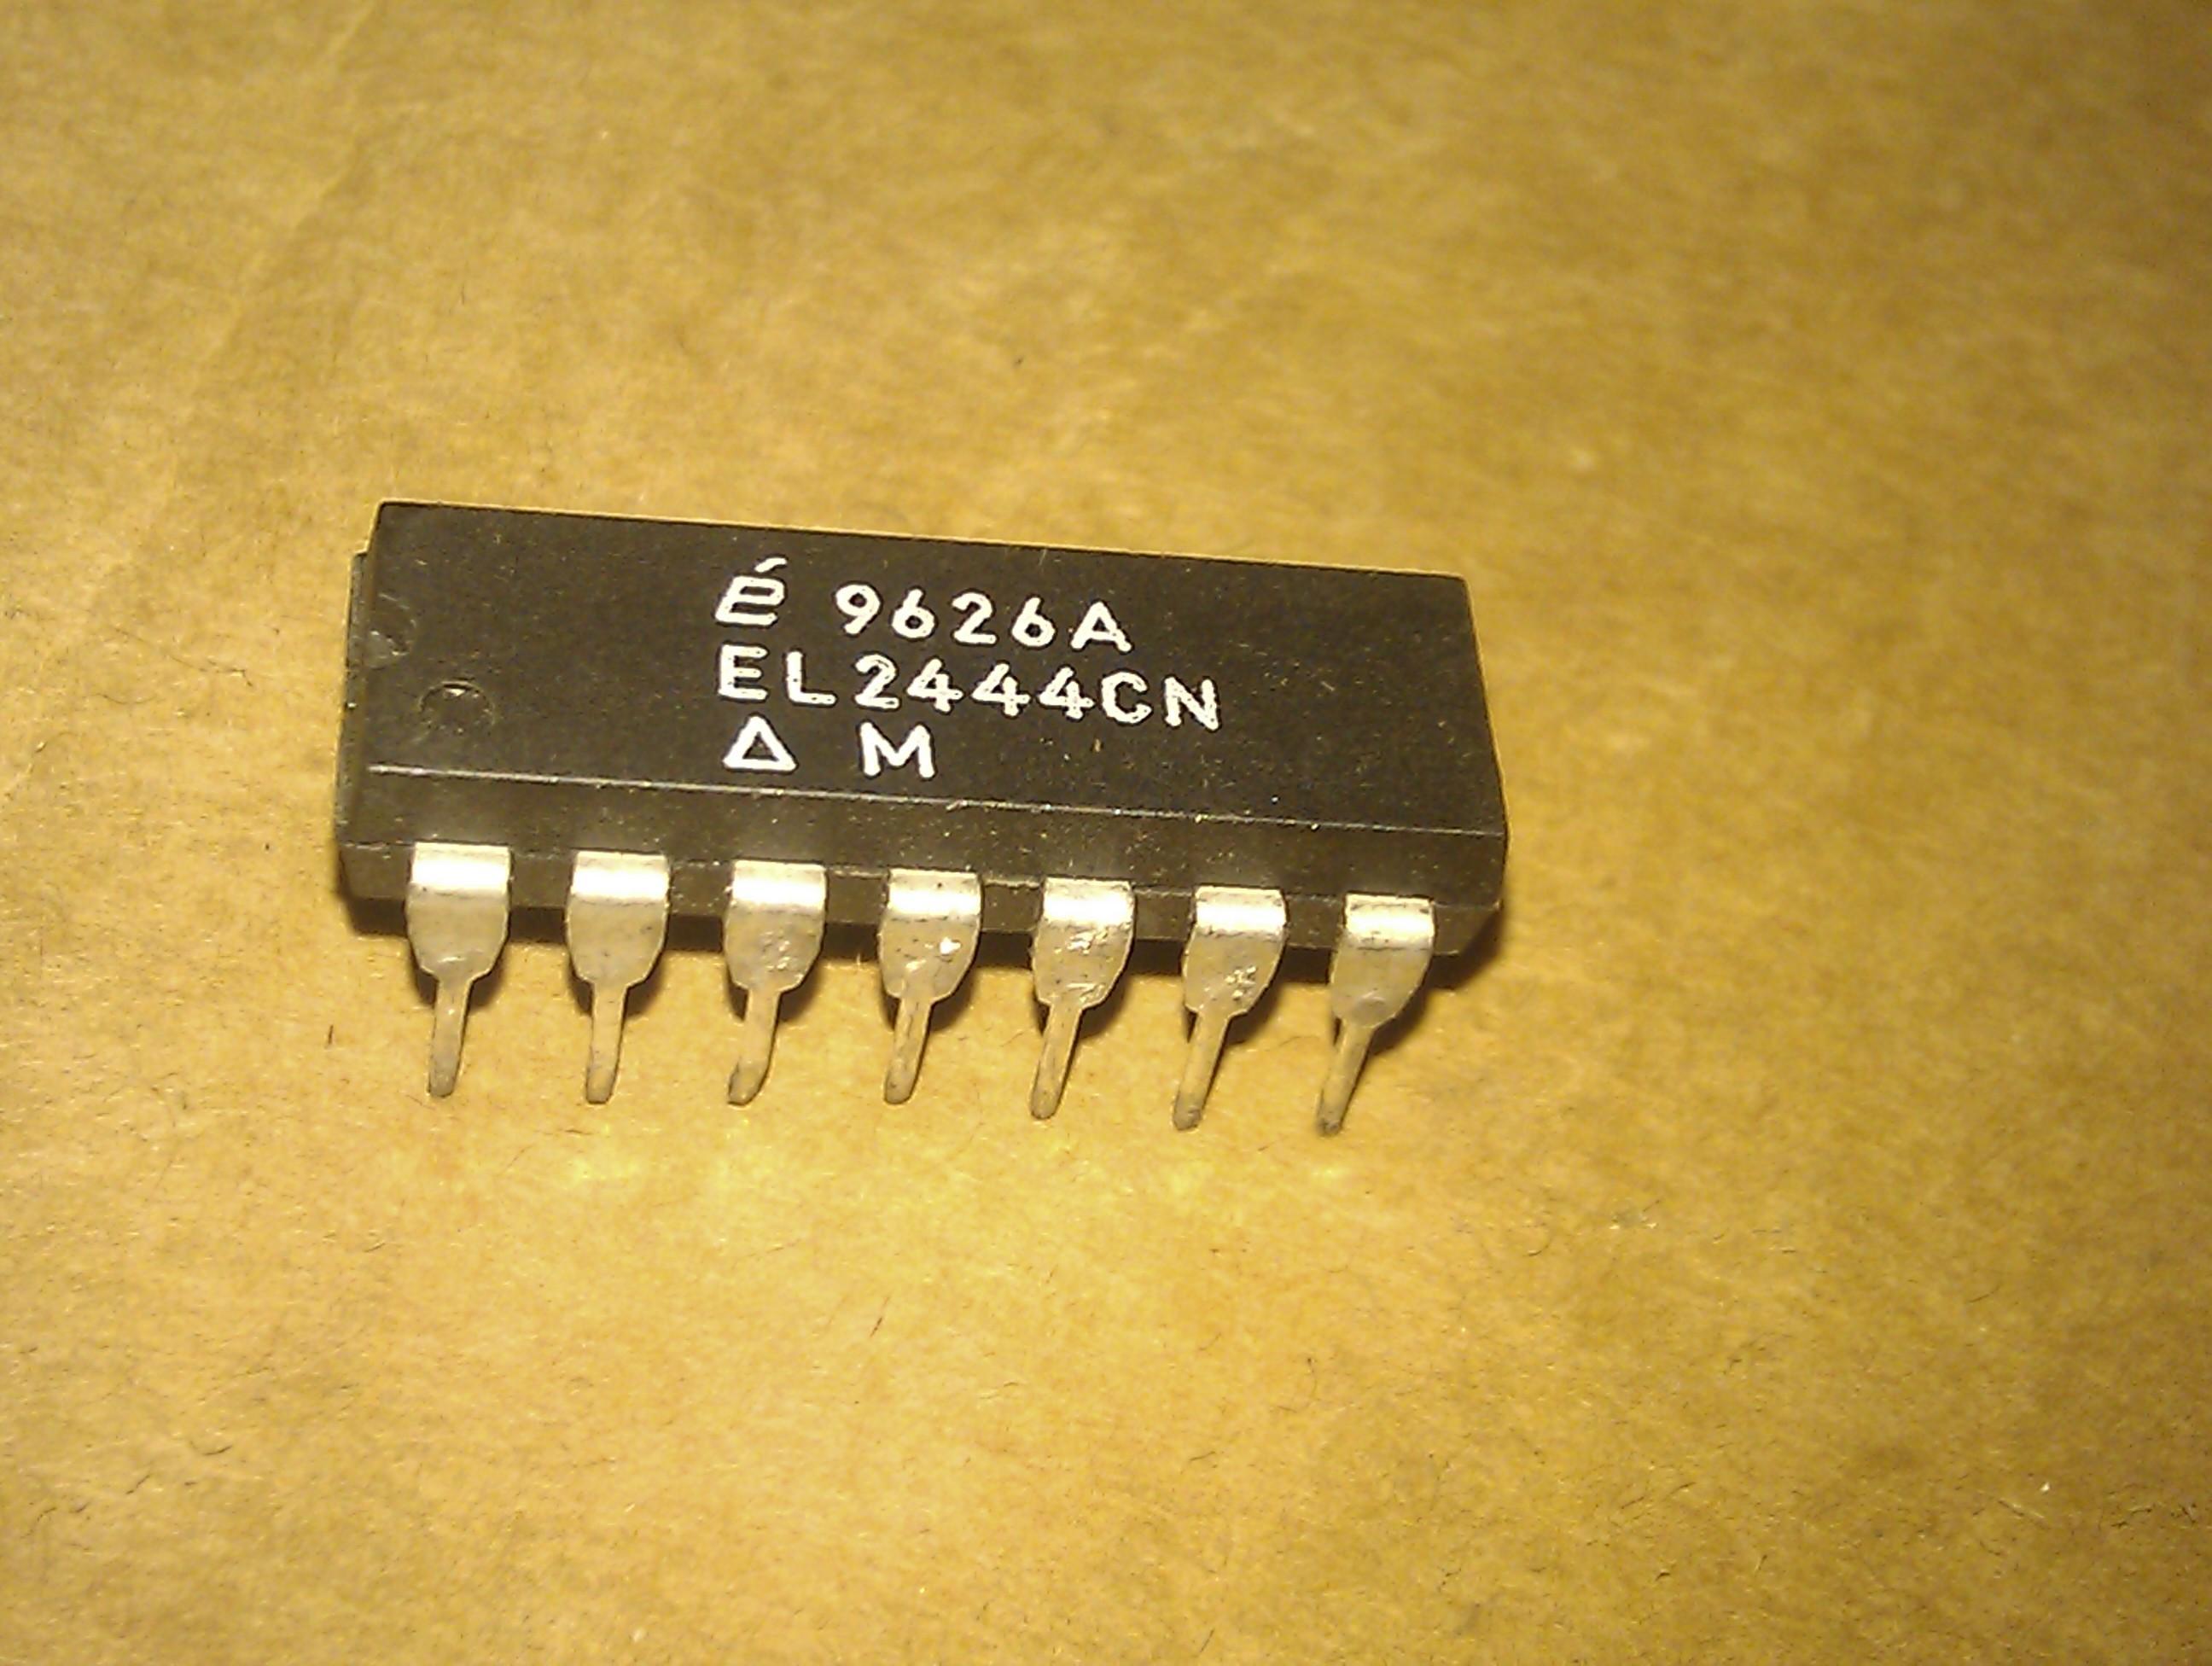 EL2444CN, EL2444. 4 CANAIS, AMPLIFICADOR DE VÍDEO, PDIP14 / pacote de plástico dip de 14 pinos em linha dupla. OP-AMP IC. Componentes eletrônicos